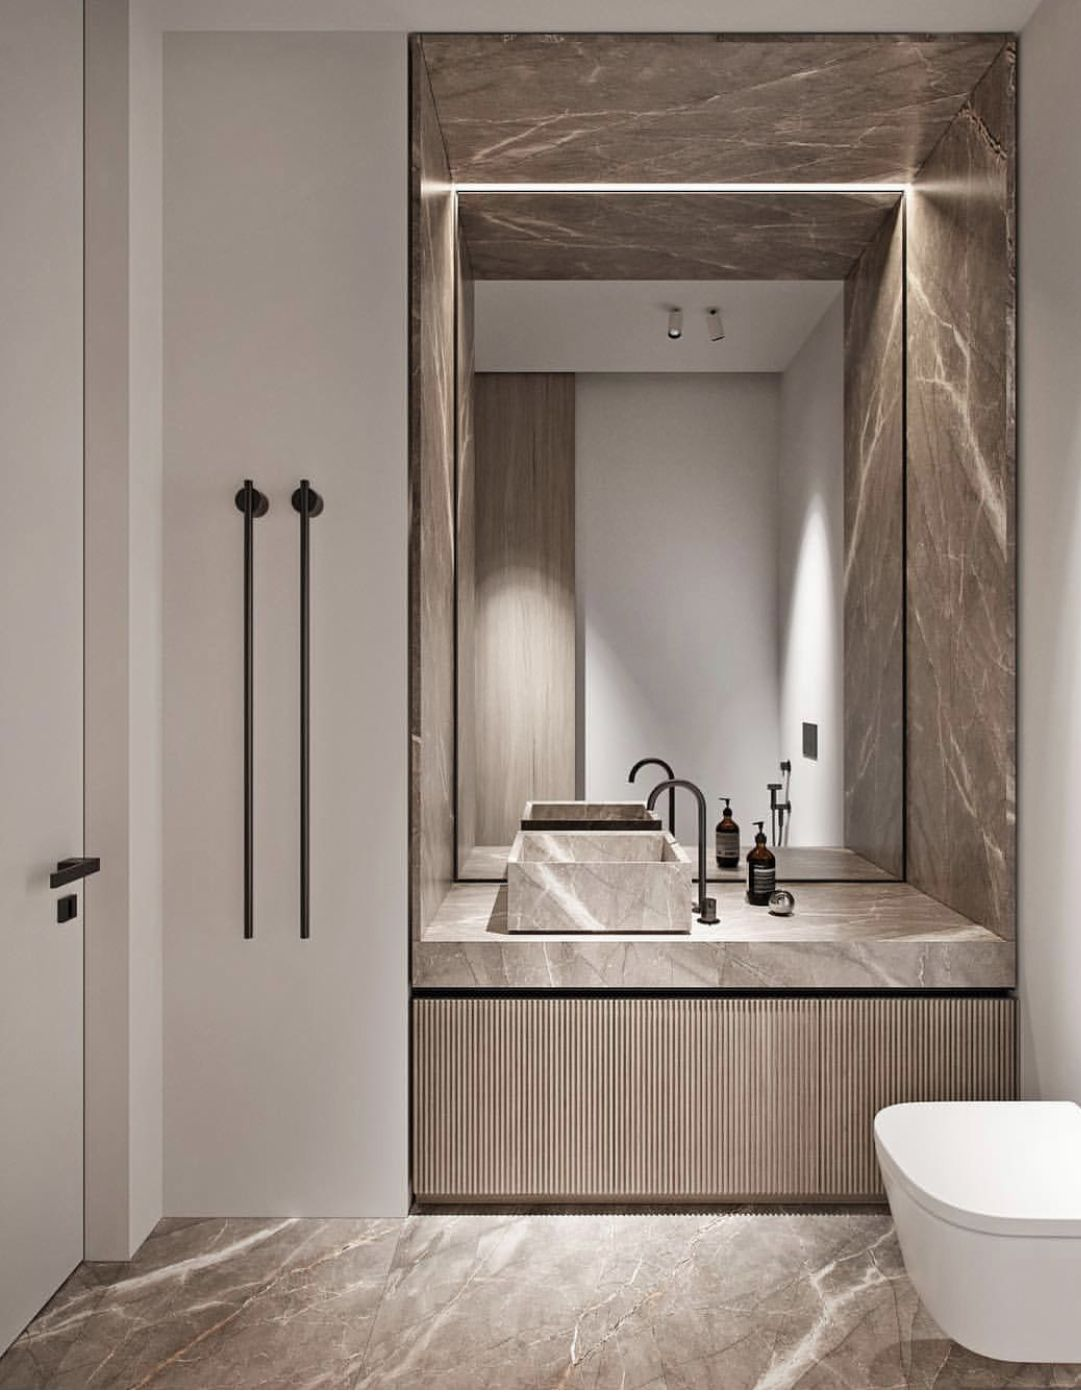 Designer Spotlight Australische Designer Traumhafte Badezimmer Badezimmer Design Badezimmer Renovieren